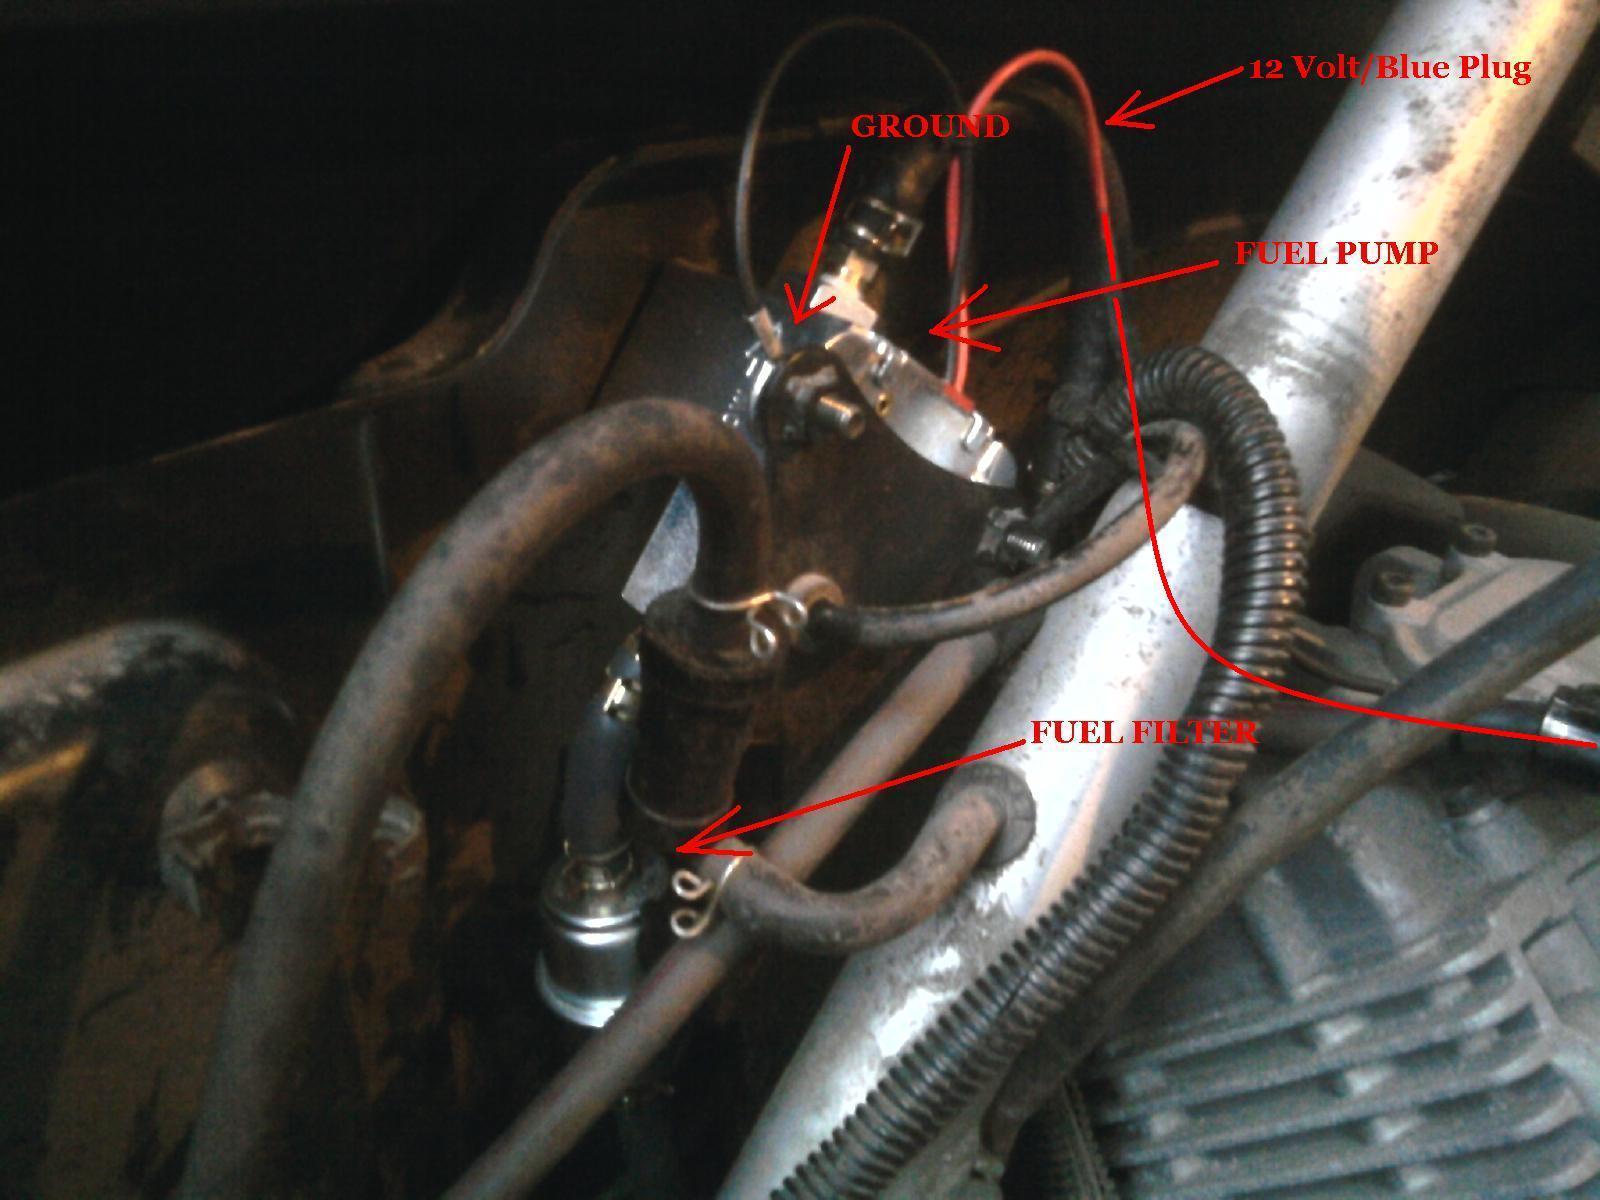 [SCHEMATICS_48YU]  What do I need to move the fuel | Yamaha Rhino Forum | Rhino Fuel Filter |  | Yamaha Rhino Forum